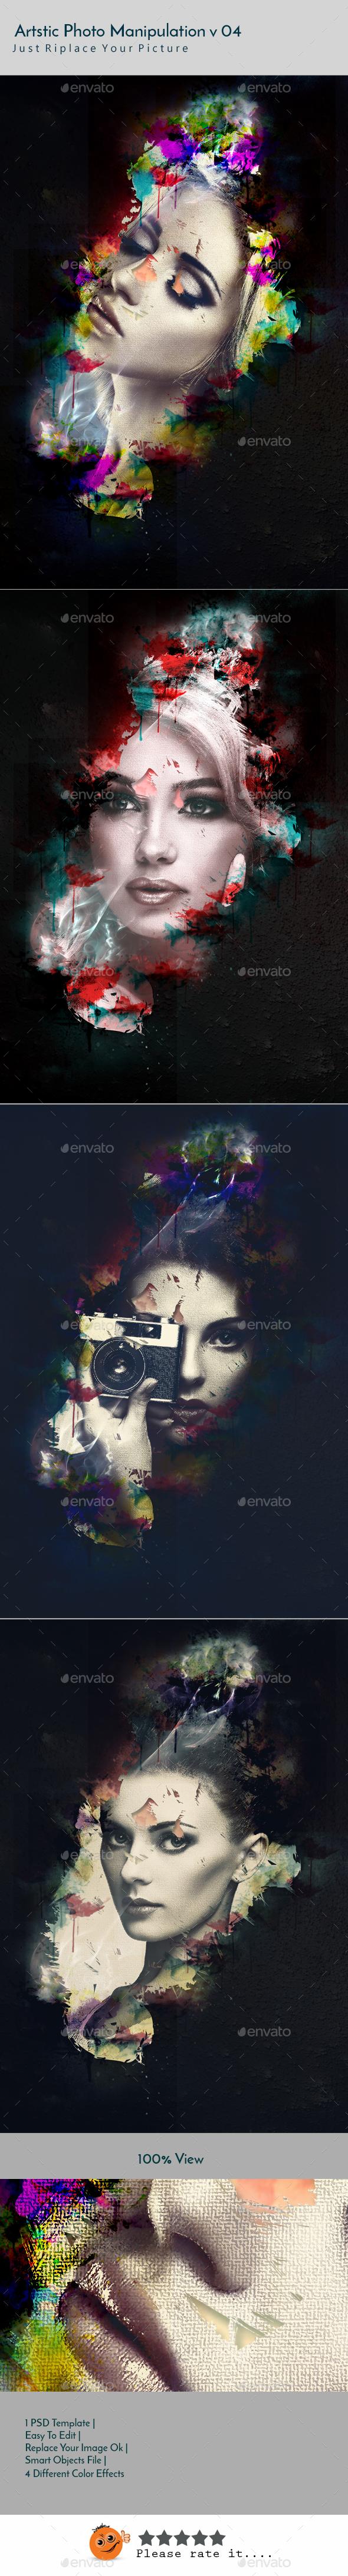 Artstic Photo Manipulation v04 - Artistic Photo Templates